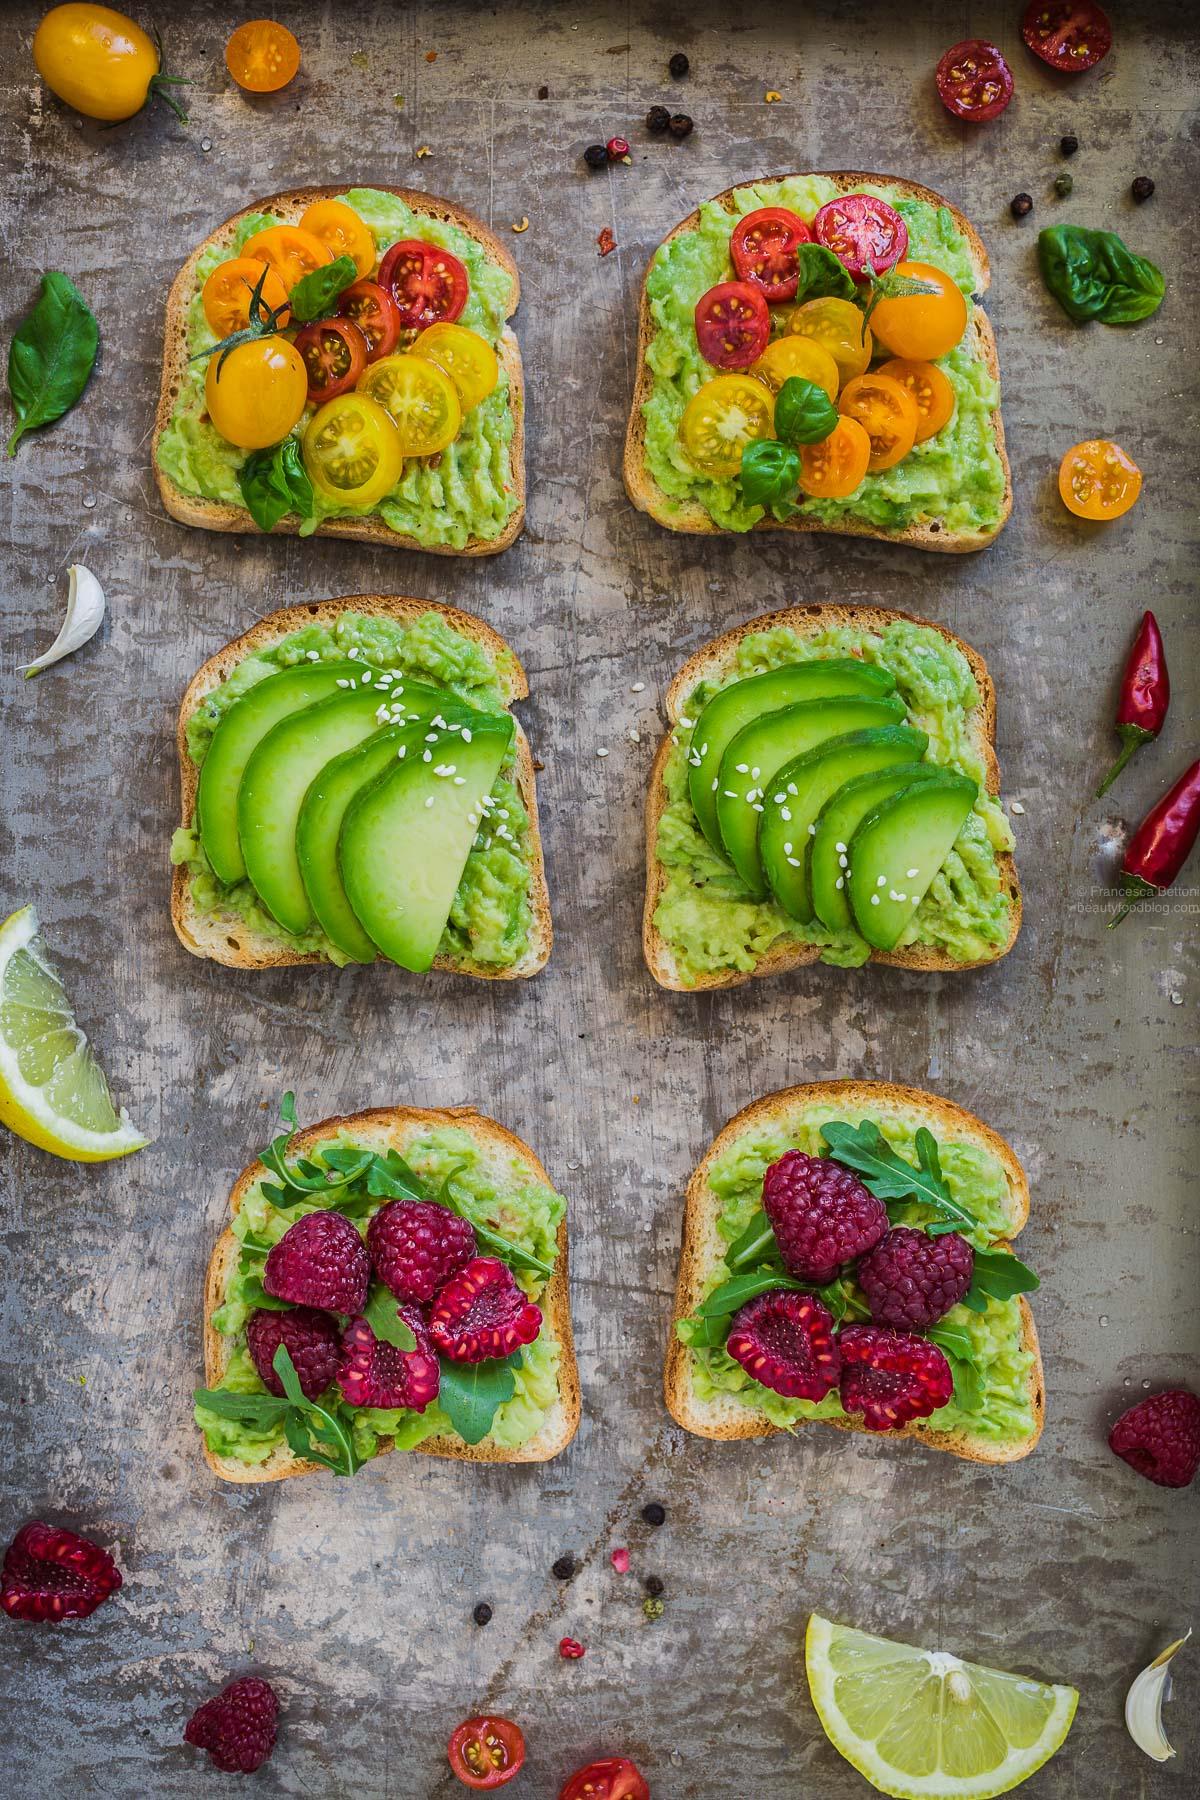 glutenfree vegan avocado toast recipe - ricetta avocado toast vegan senza glutine